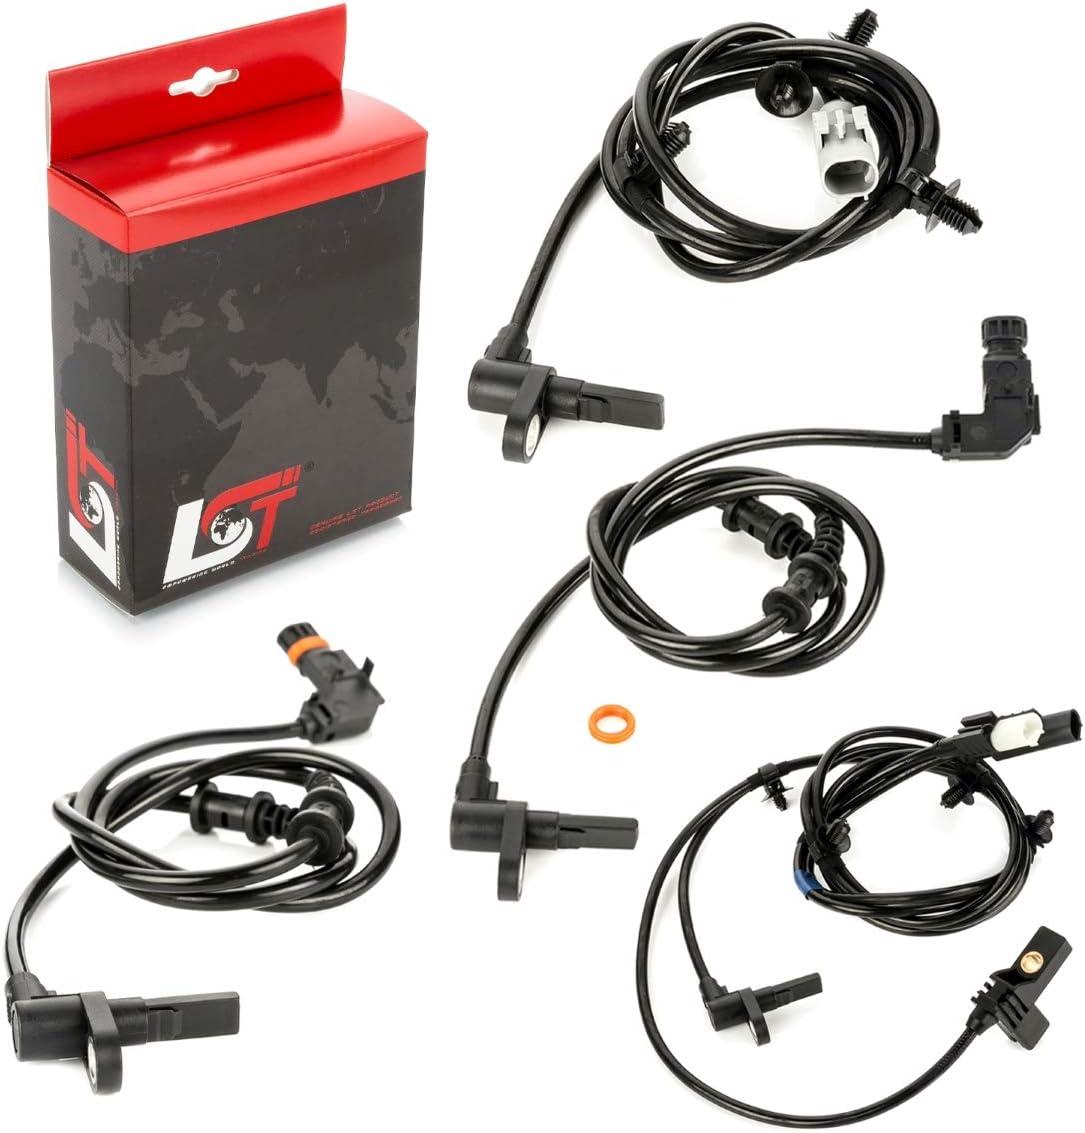 LST 4x ABS Sensor Drehzahlregler Set vorne hinten VITO VIANO W639